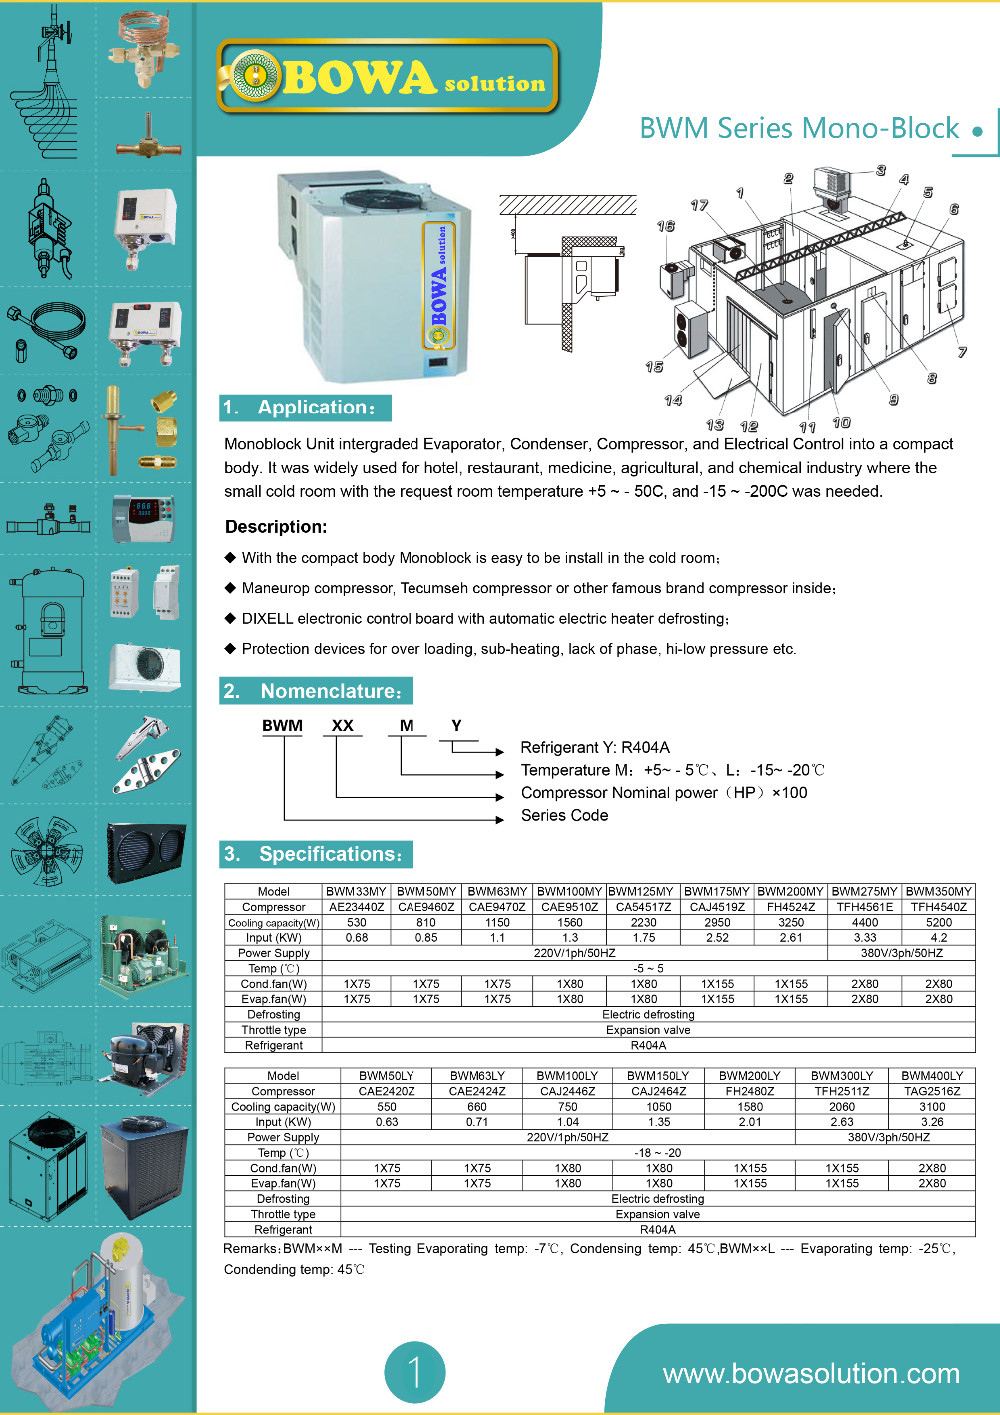 2m3 Freezer Room Refrigeration Unit Including Evaporator Condenser Maneurop Compressor Electrical Drawing Bwm Series Monoblock 1